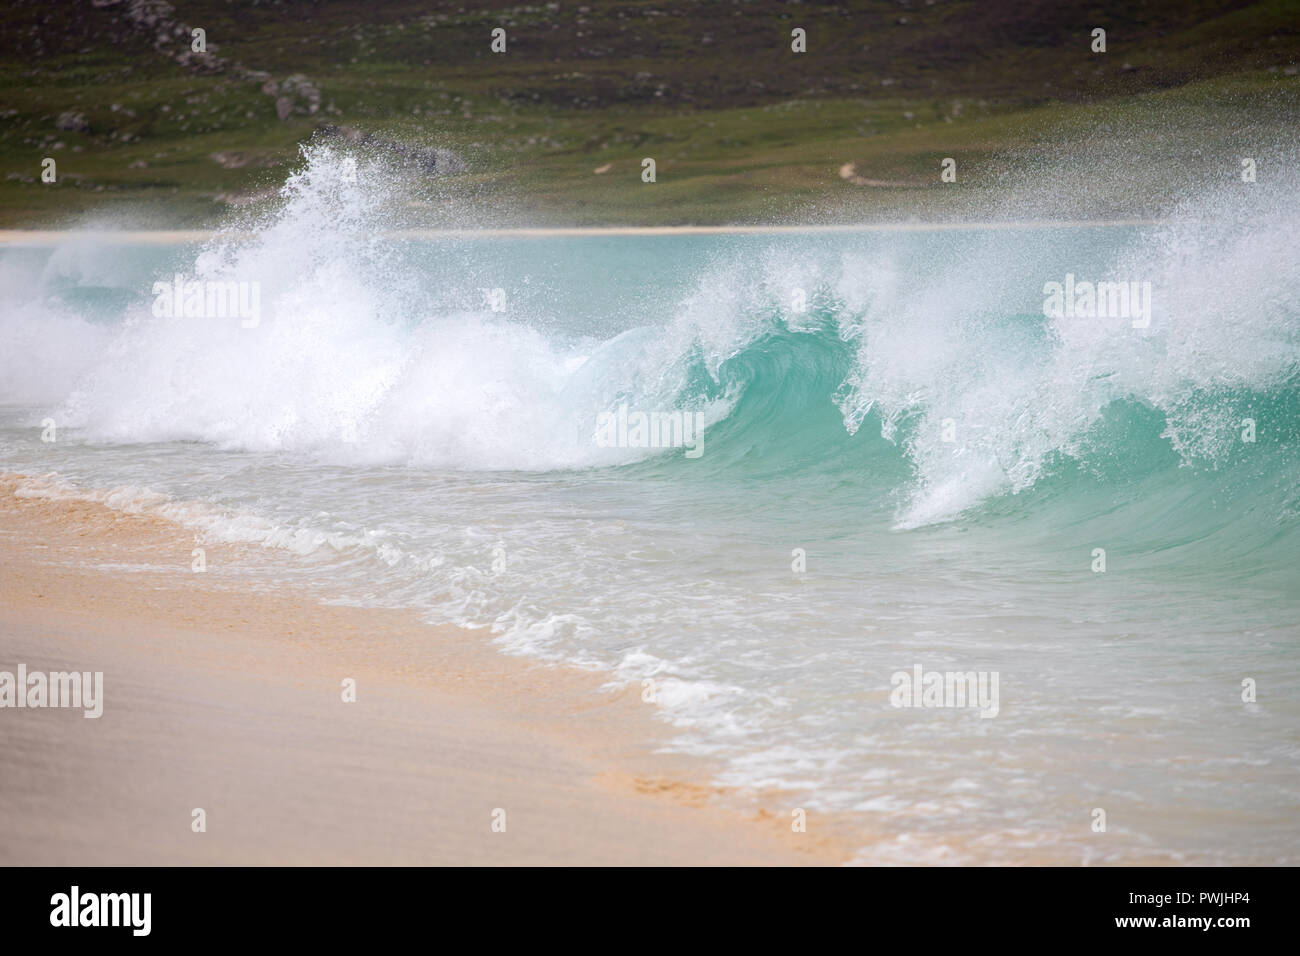 Breaking wave on Scarista beach, Harris, Outer Hebrides, Scotland, UK - Stock Image